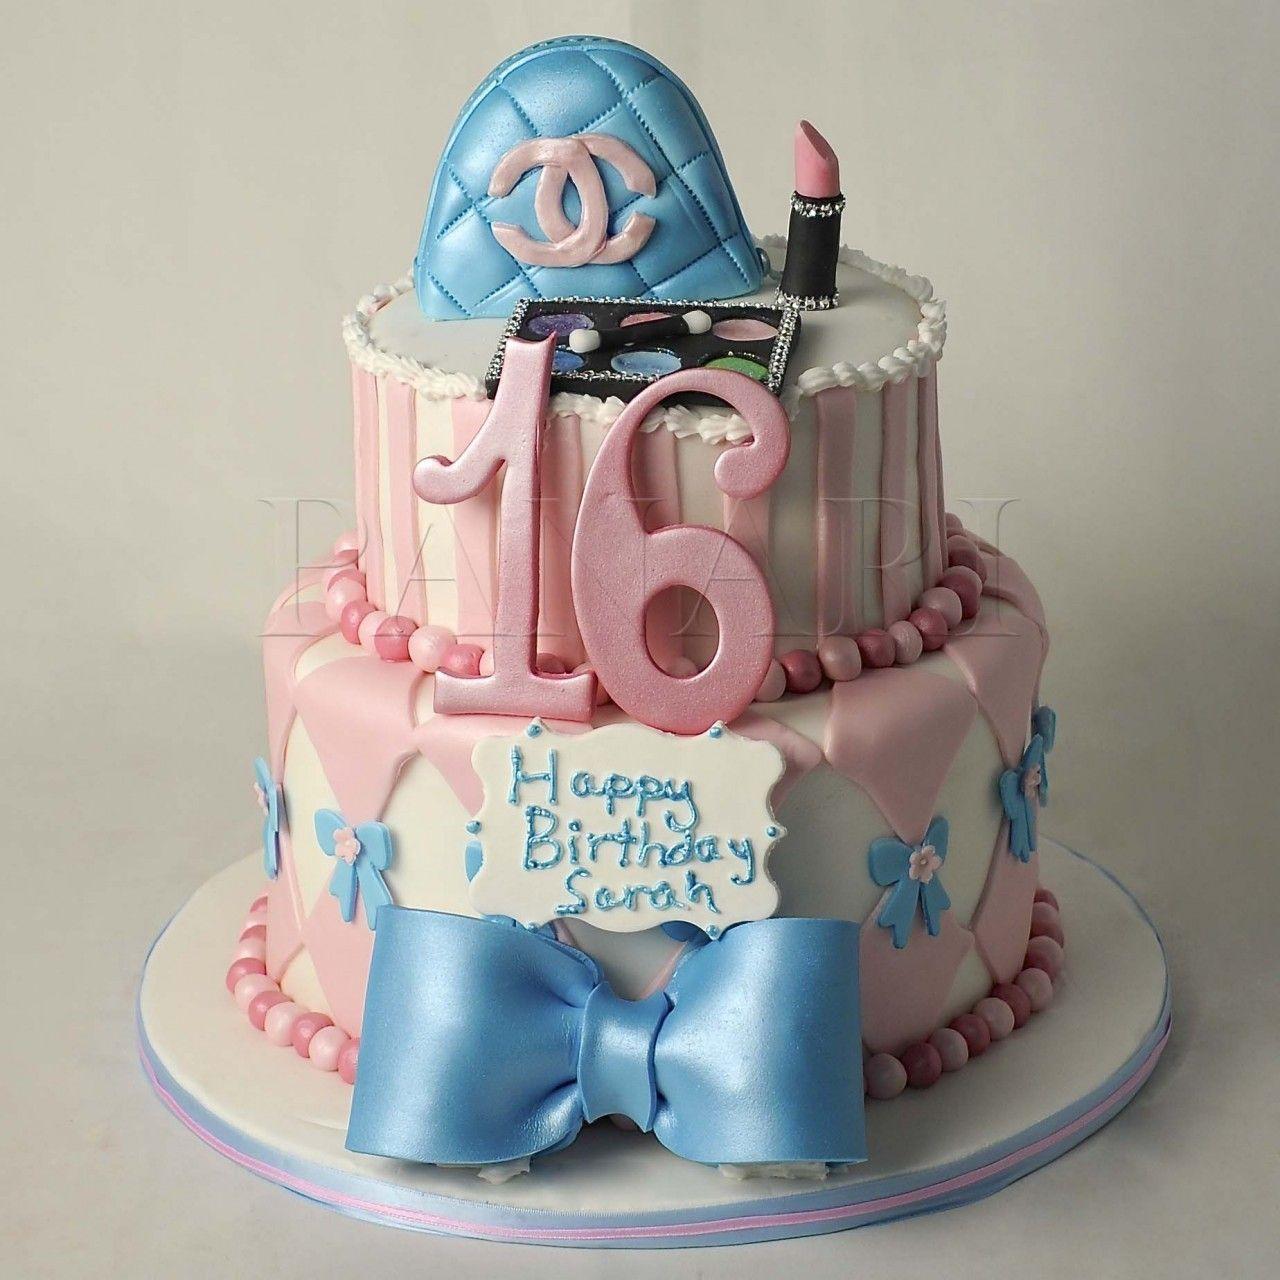 16th Birthday cakes httpbirthdaycakepicturescomtop16th